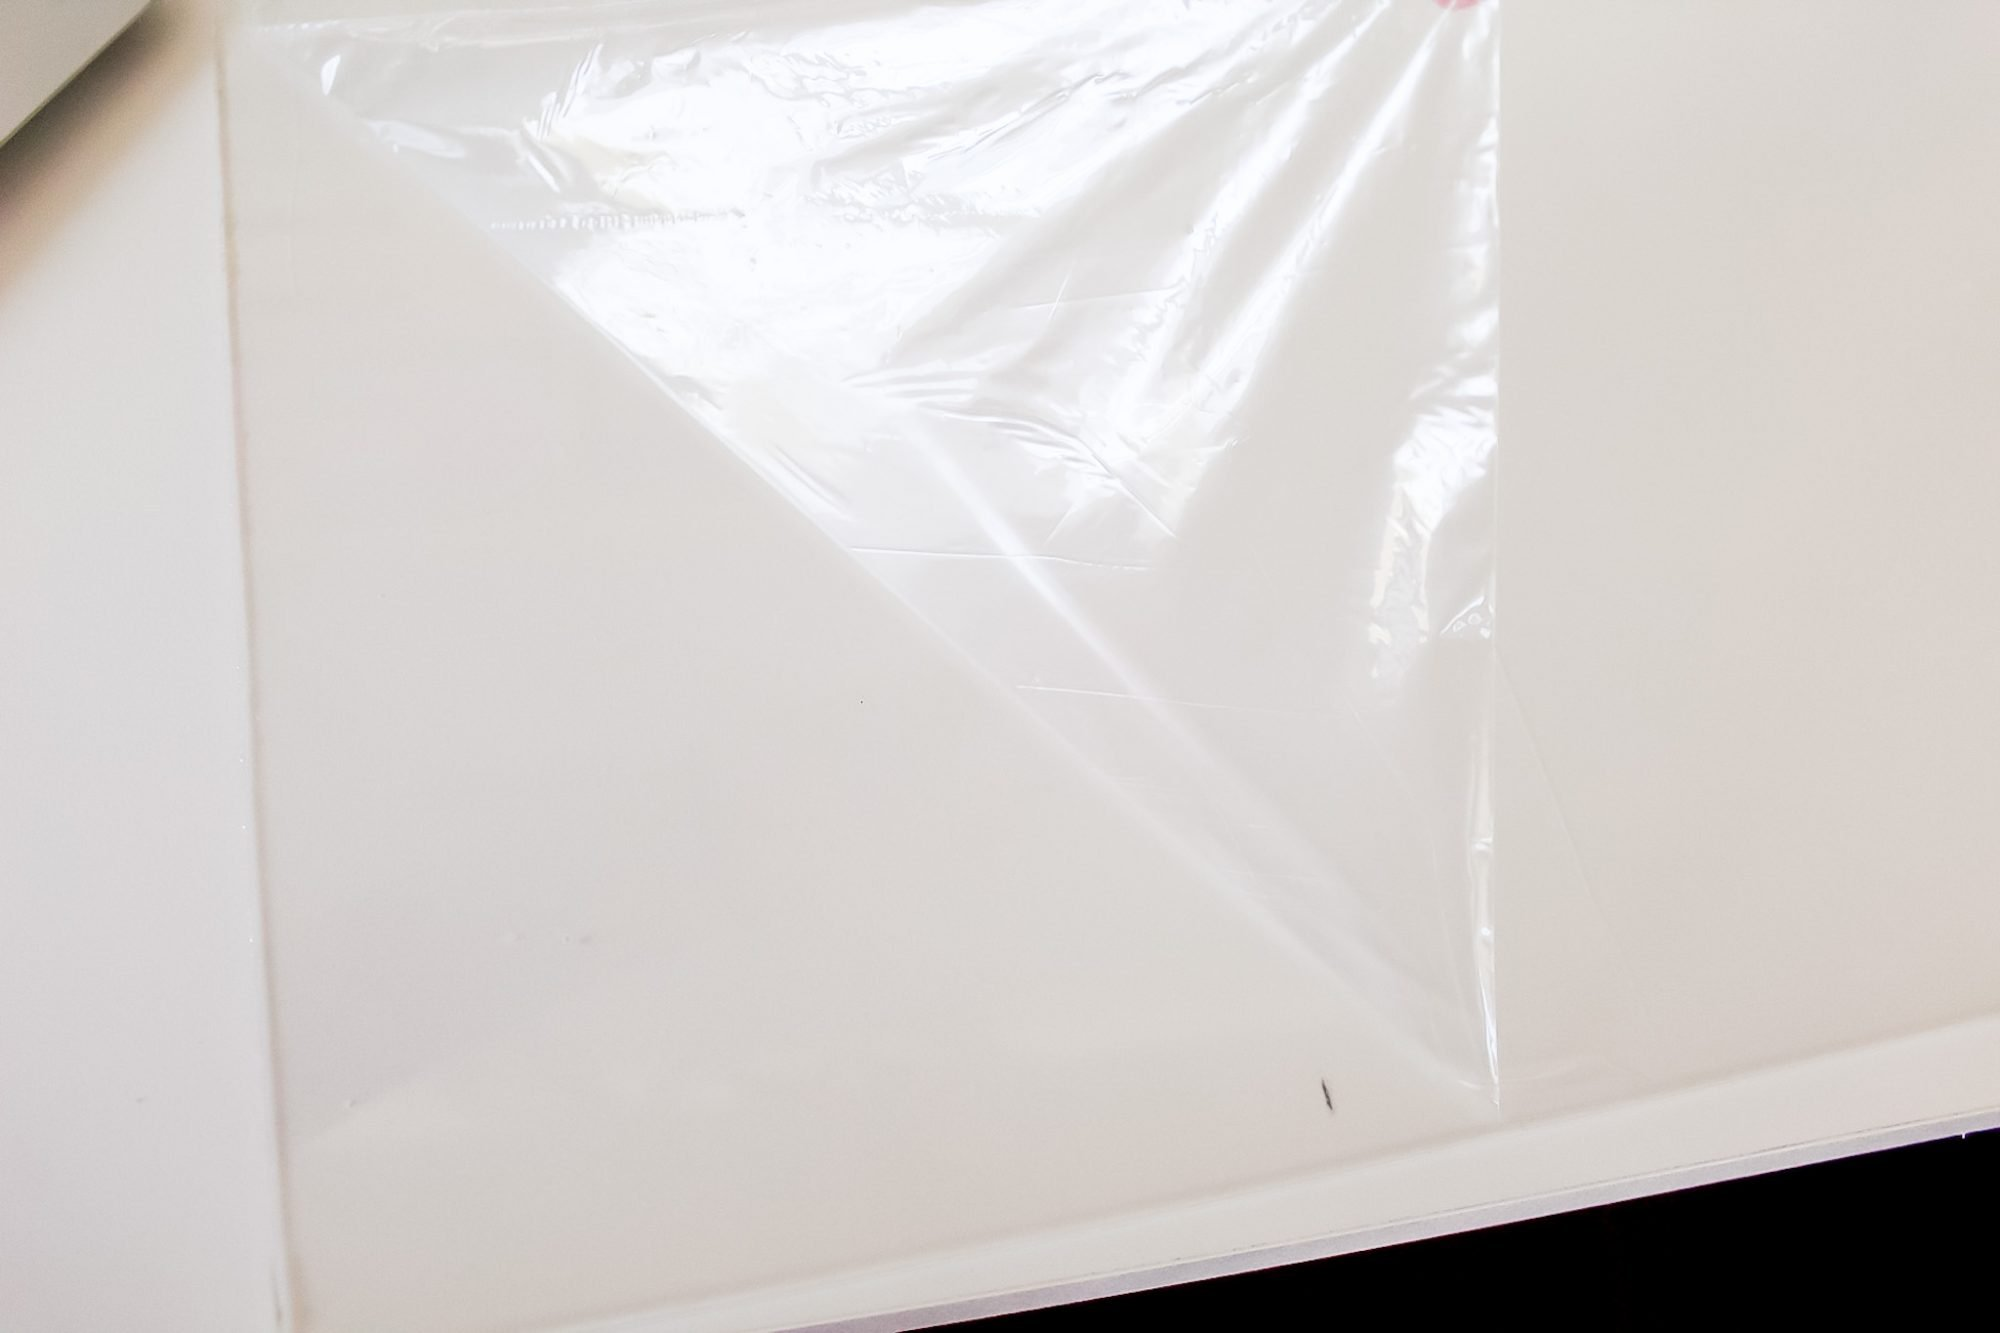 peeling liner off acrylic sheet